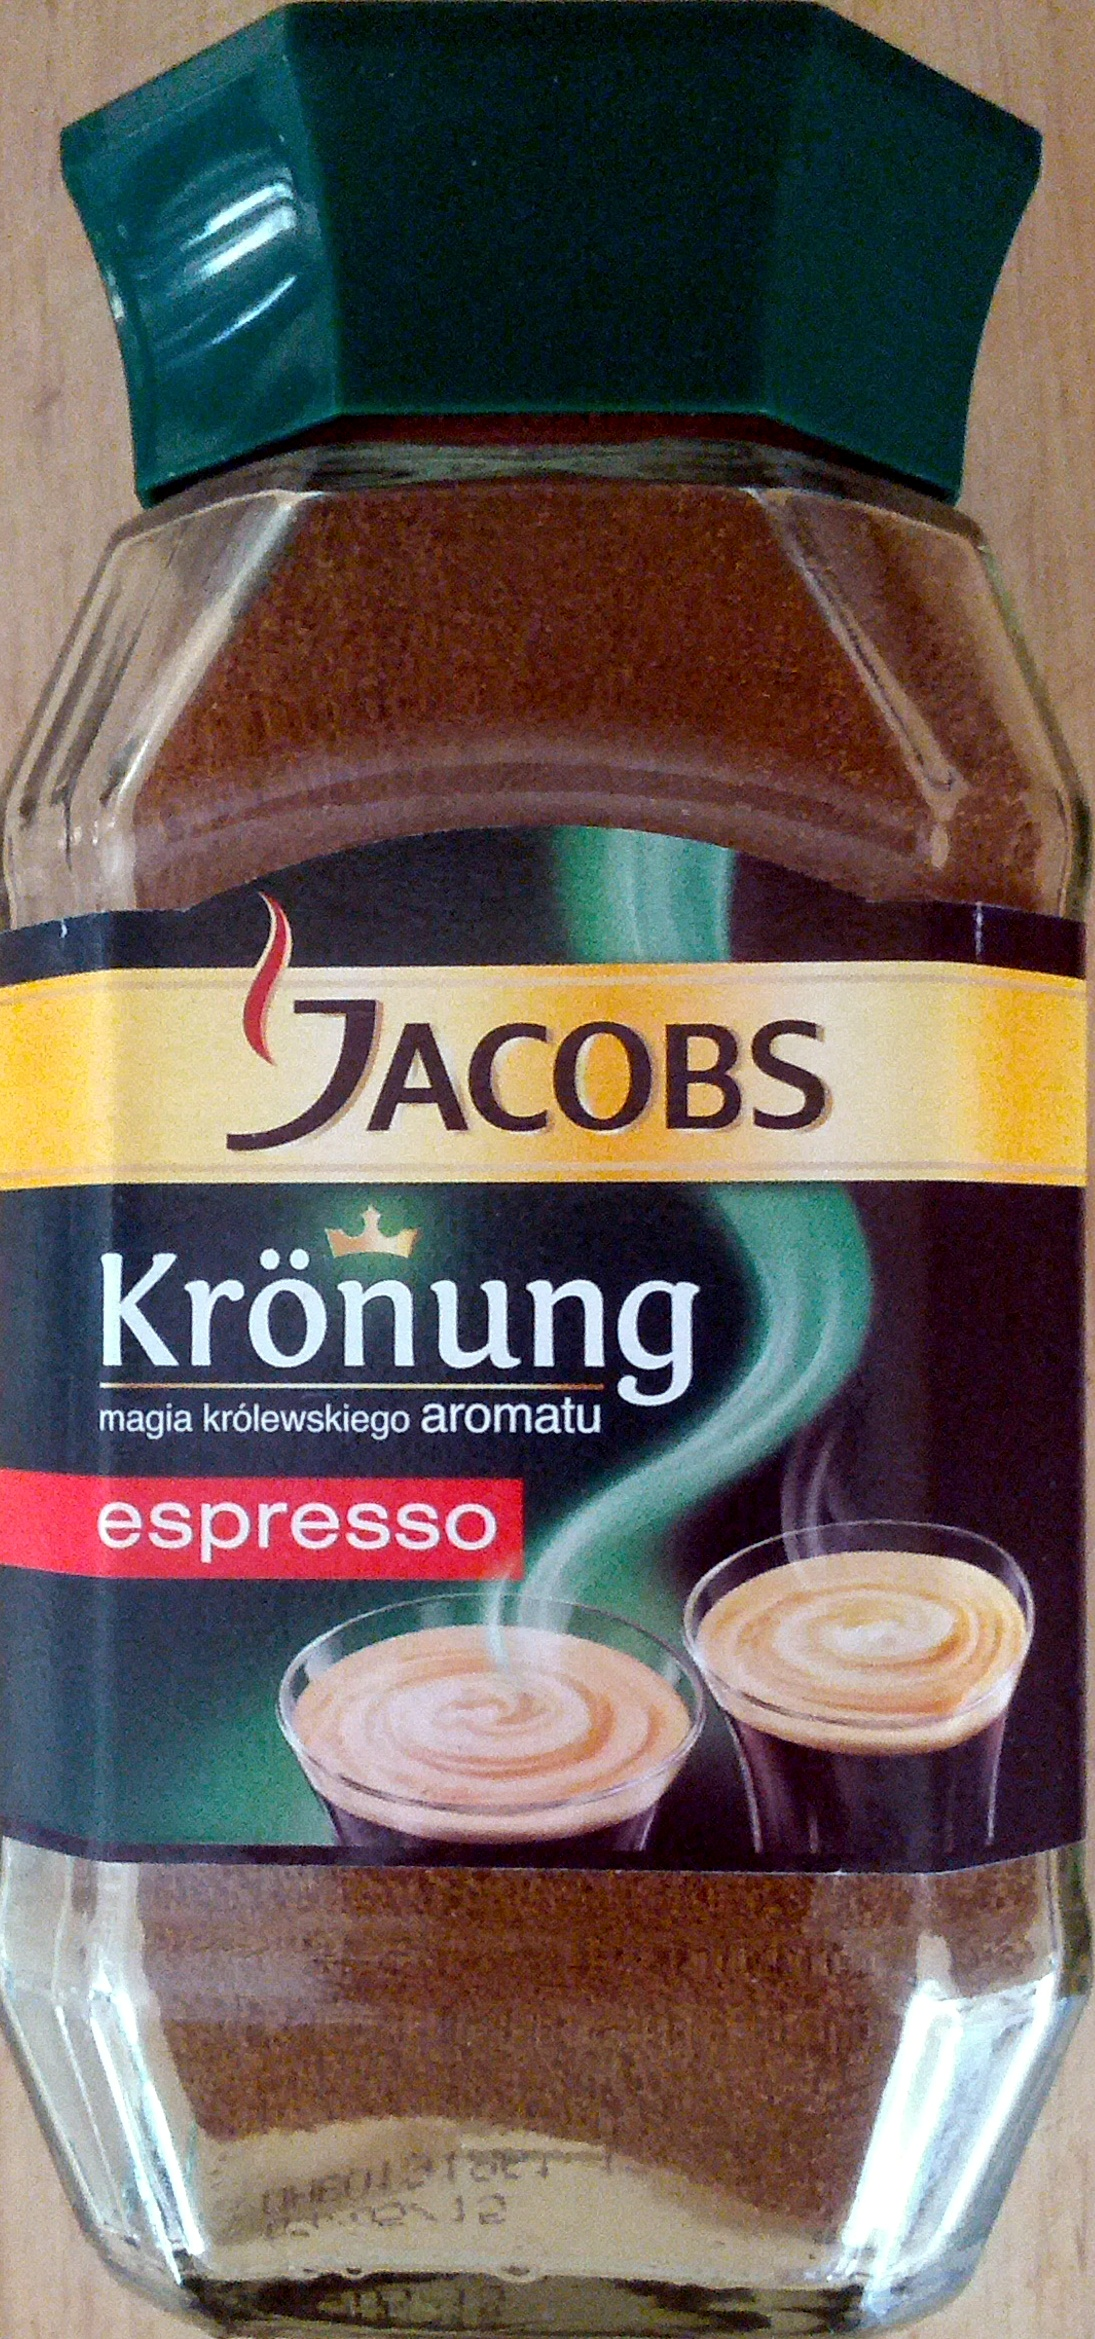 Jacobs Krönung Espresso - Produkt - pl